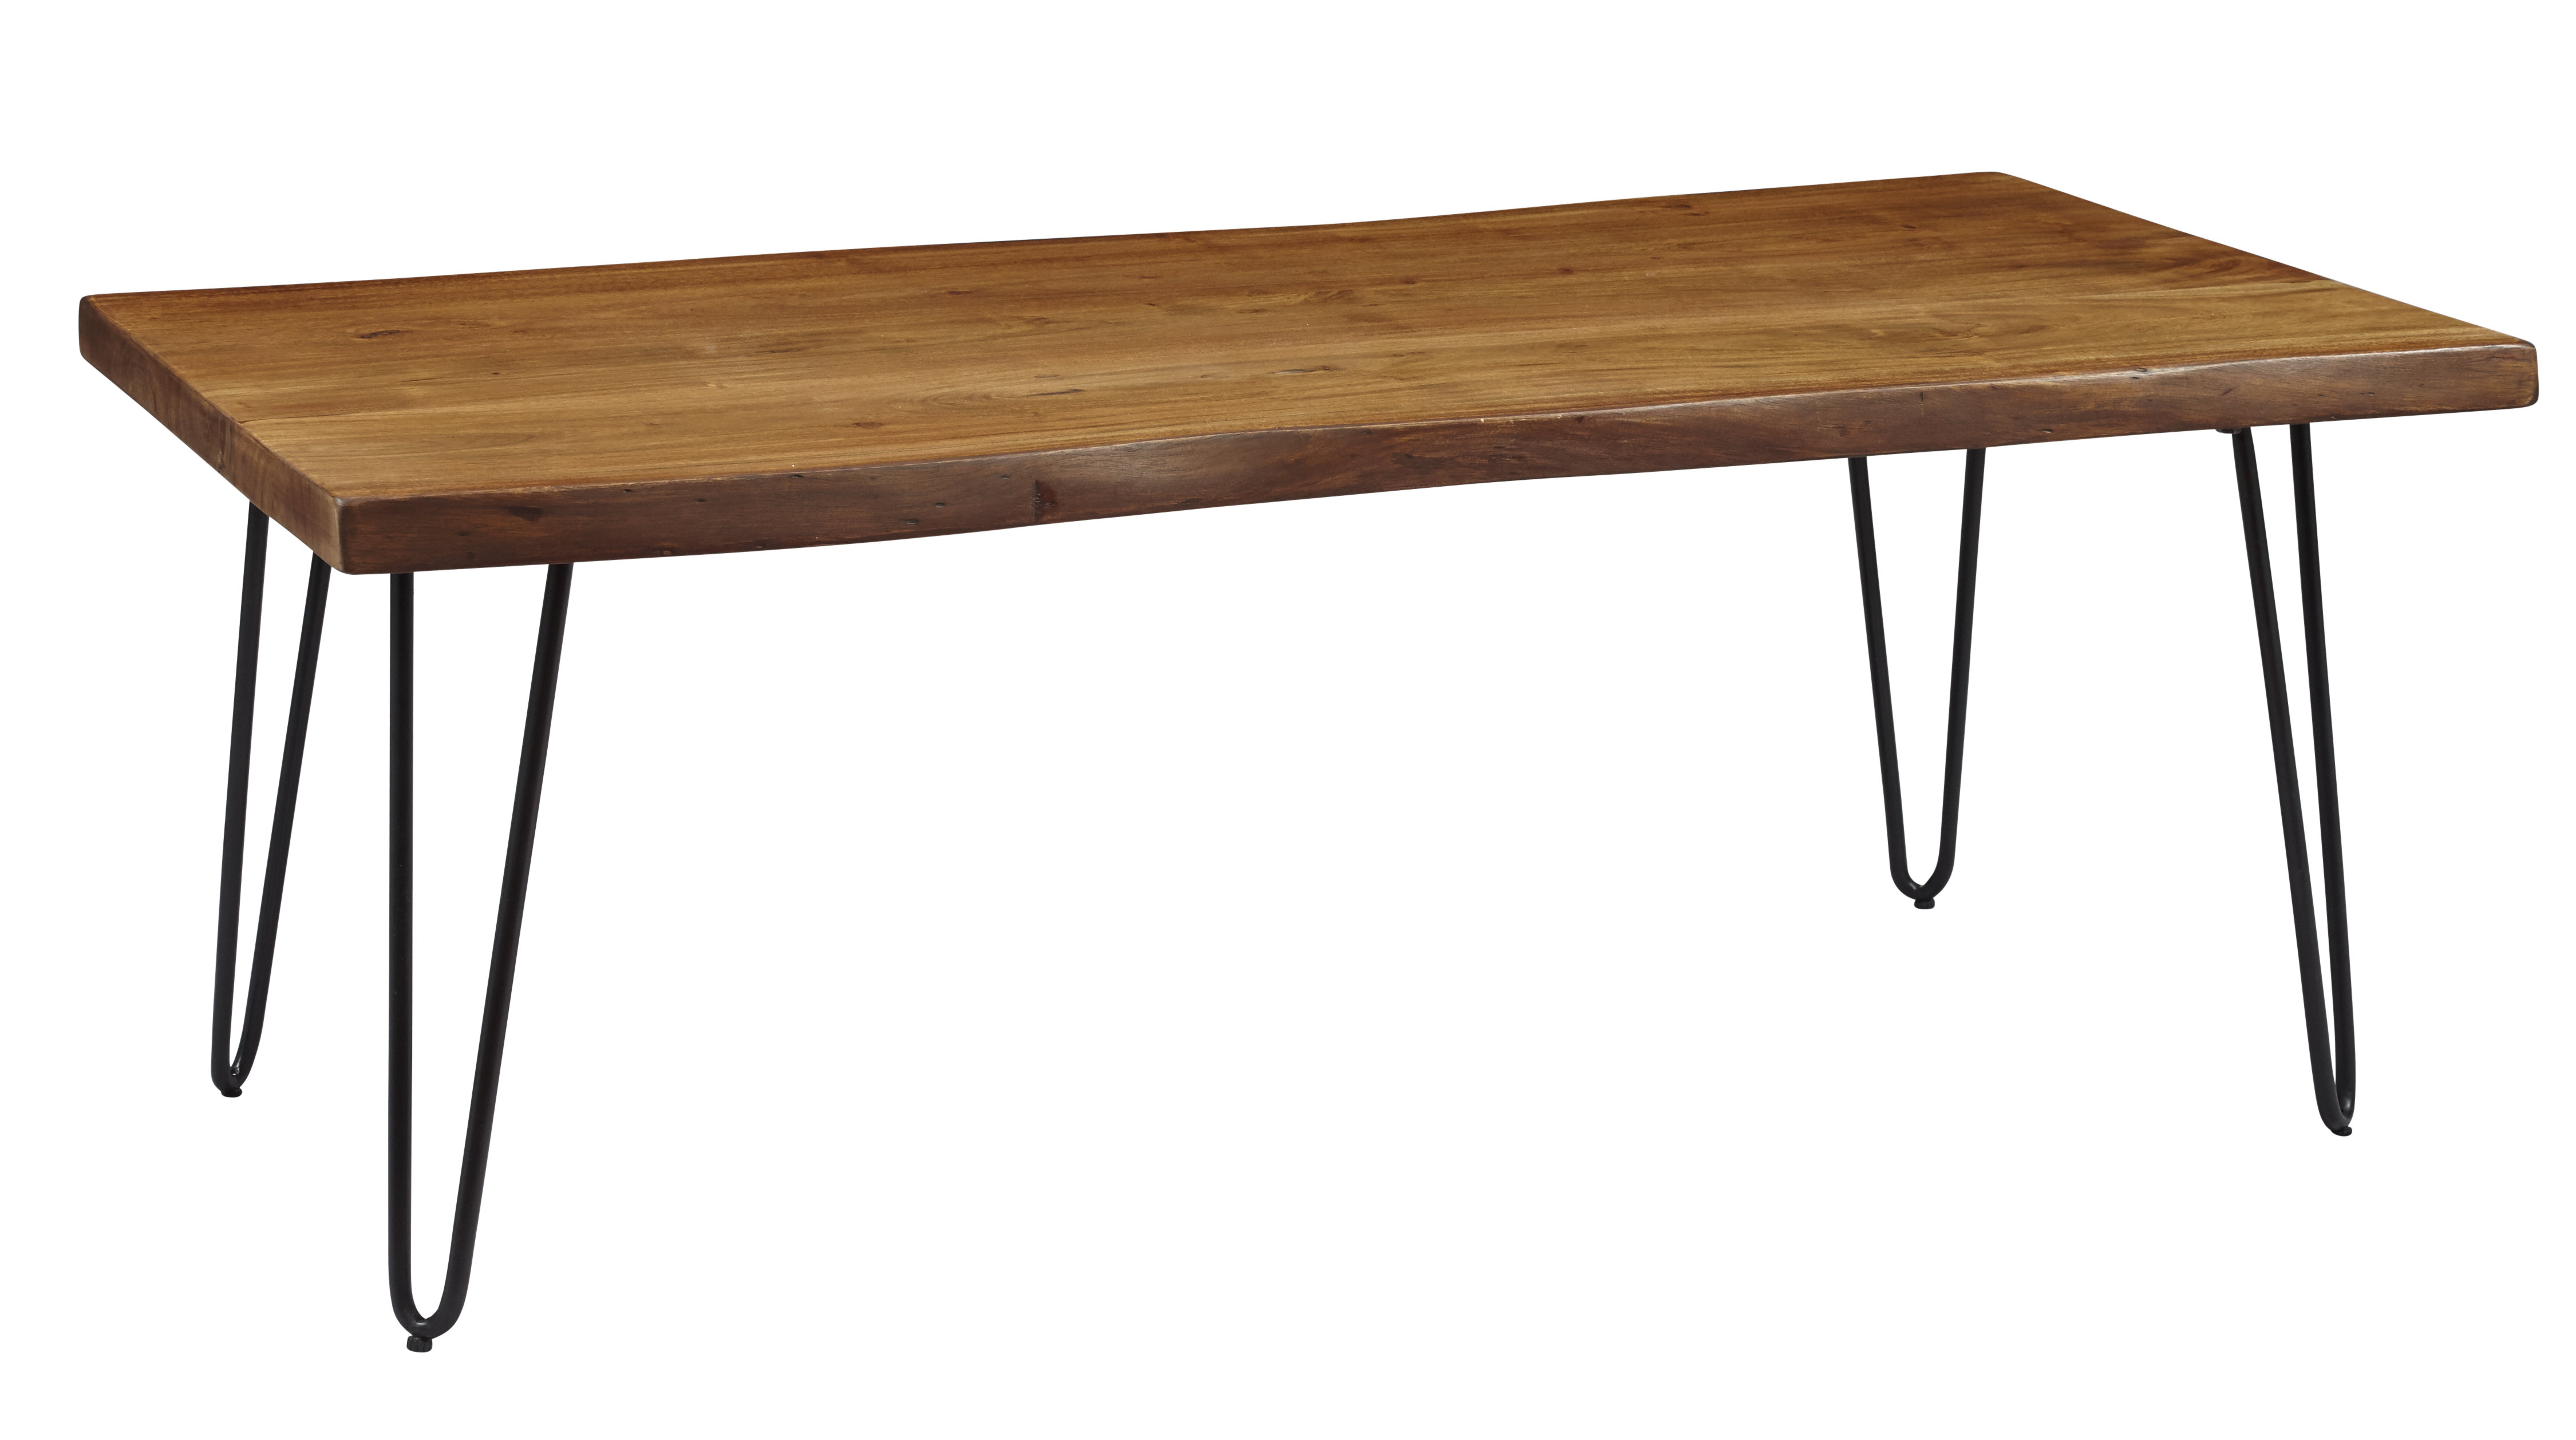 Union Rustic Coosada Wooden Metal Hairpin Legs Coffee Table Wayfair with regard to measurements 4500 X 2515